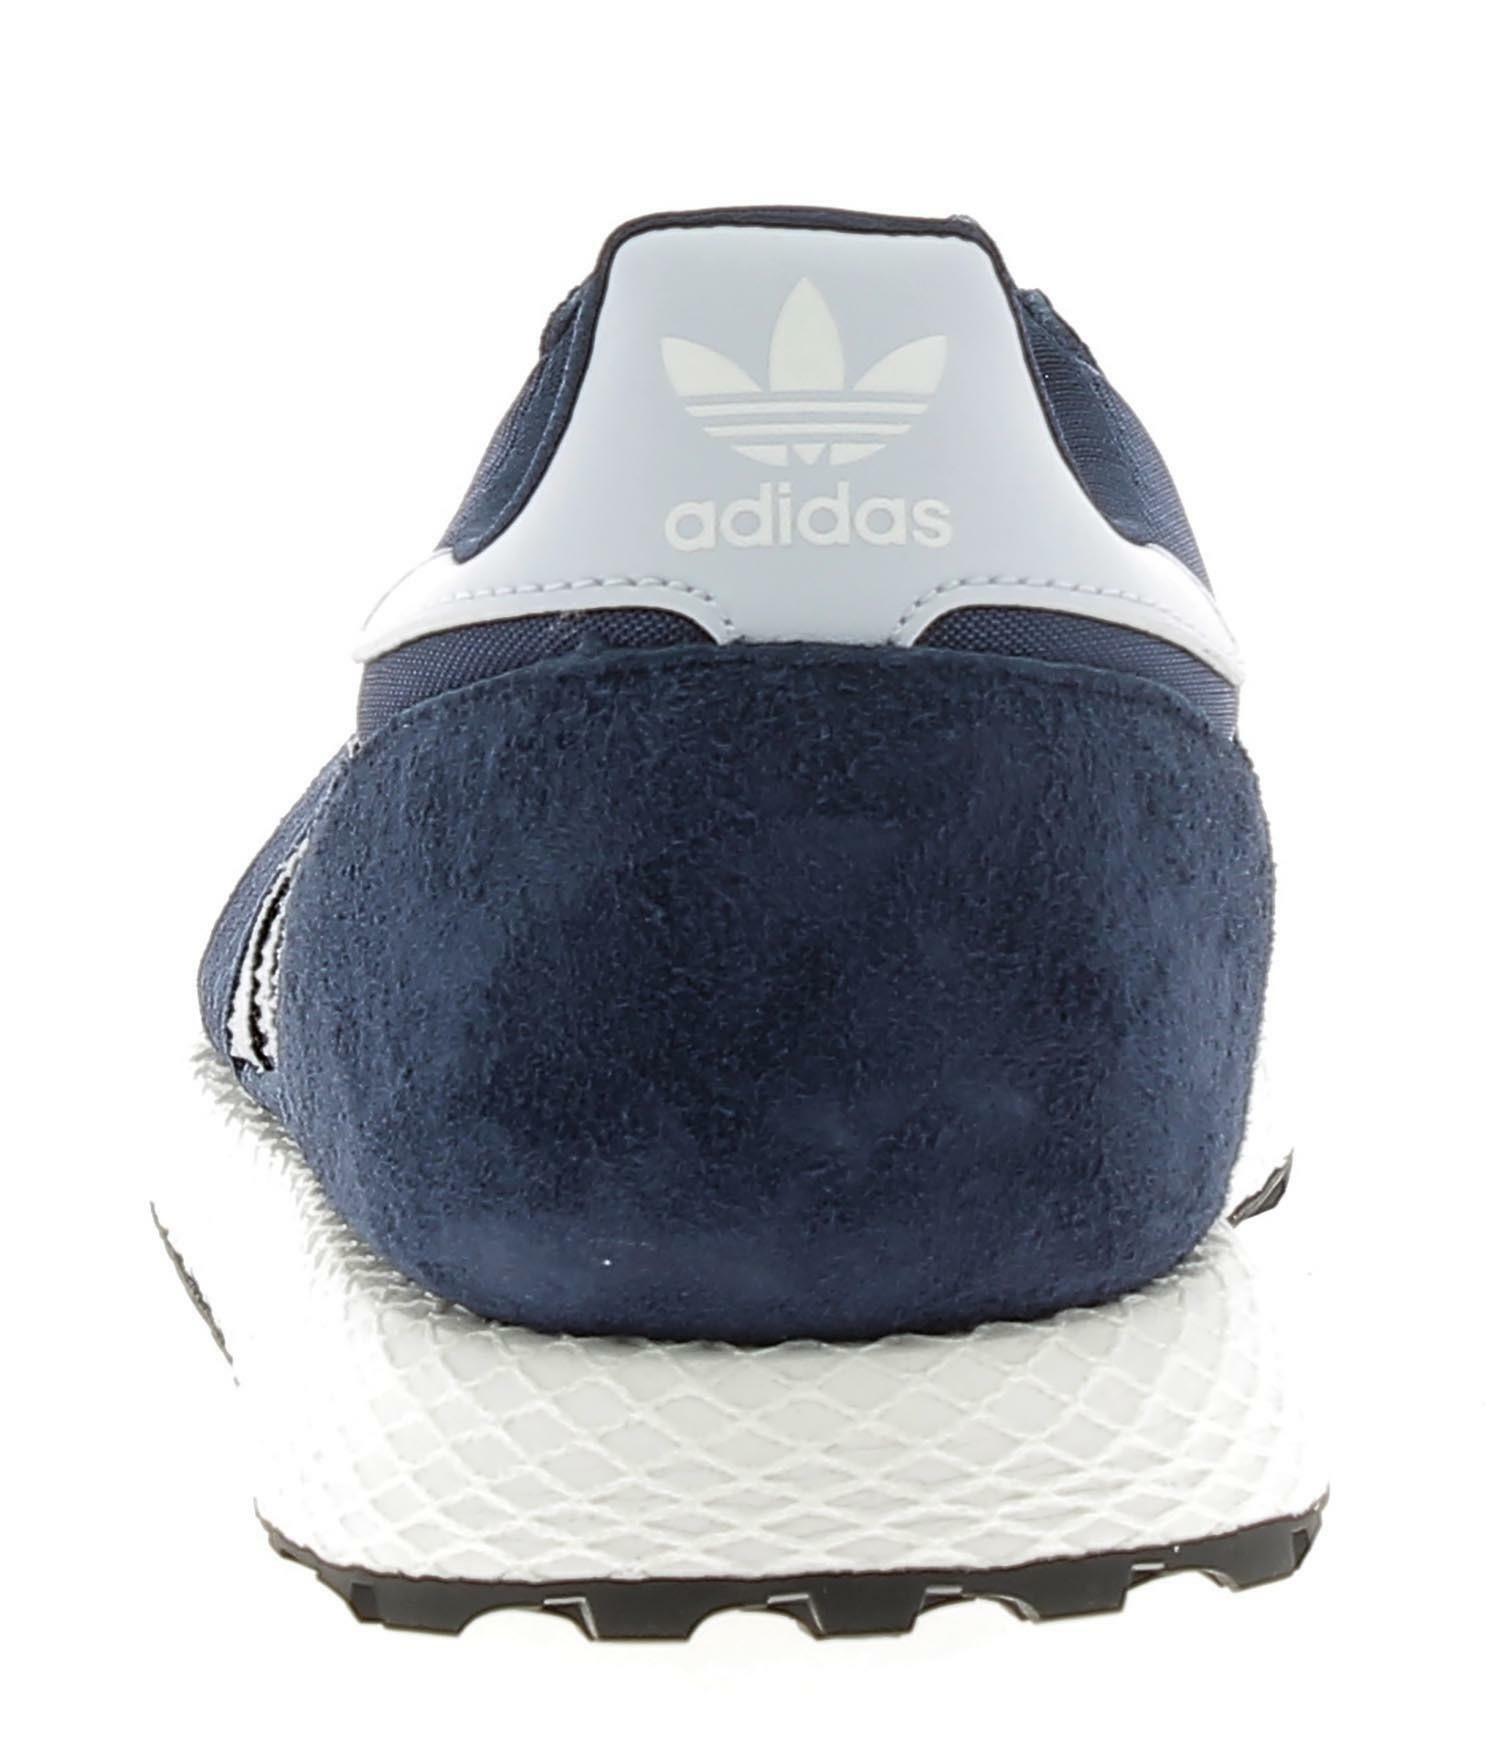 Forest Fktlju51c3 Grove Adidas Blu Scarpa Uomo Sportiva D96630 sdthQxrC